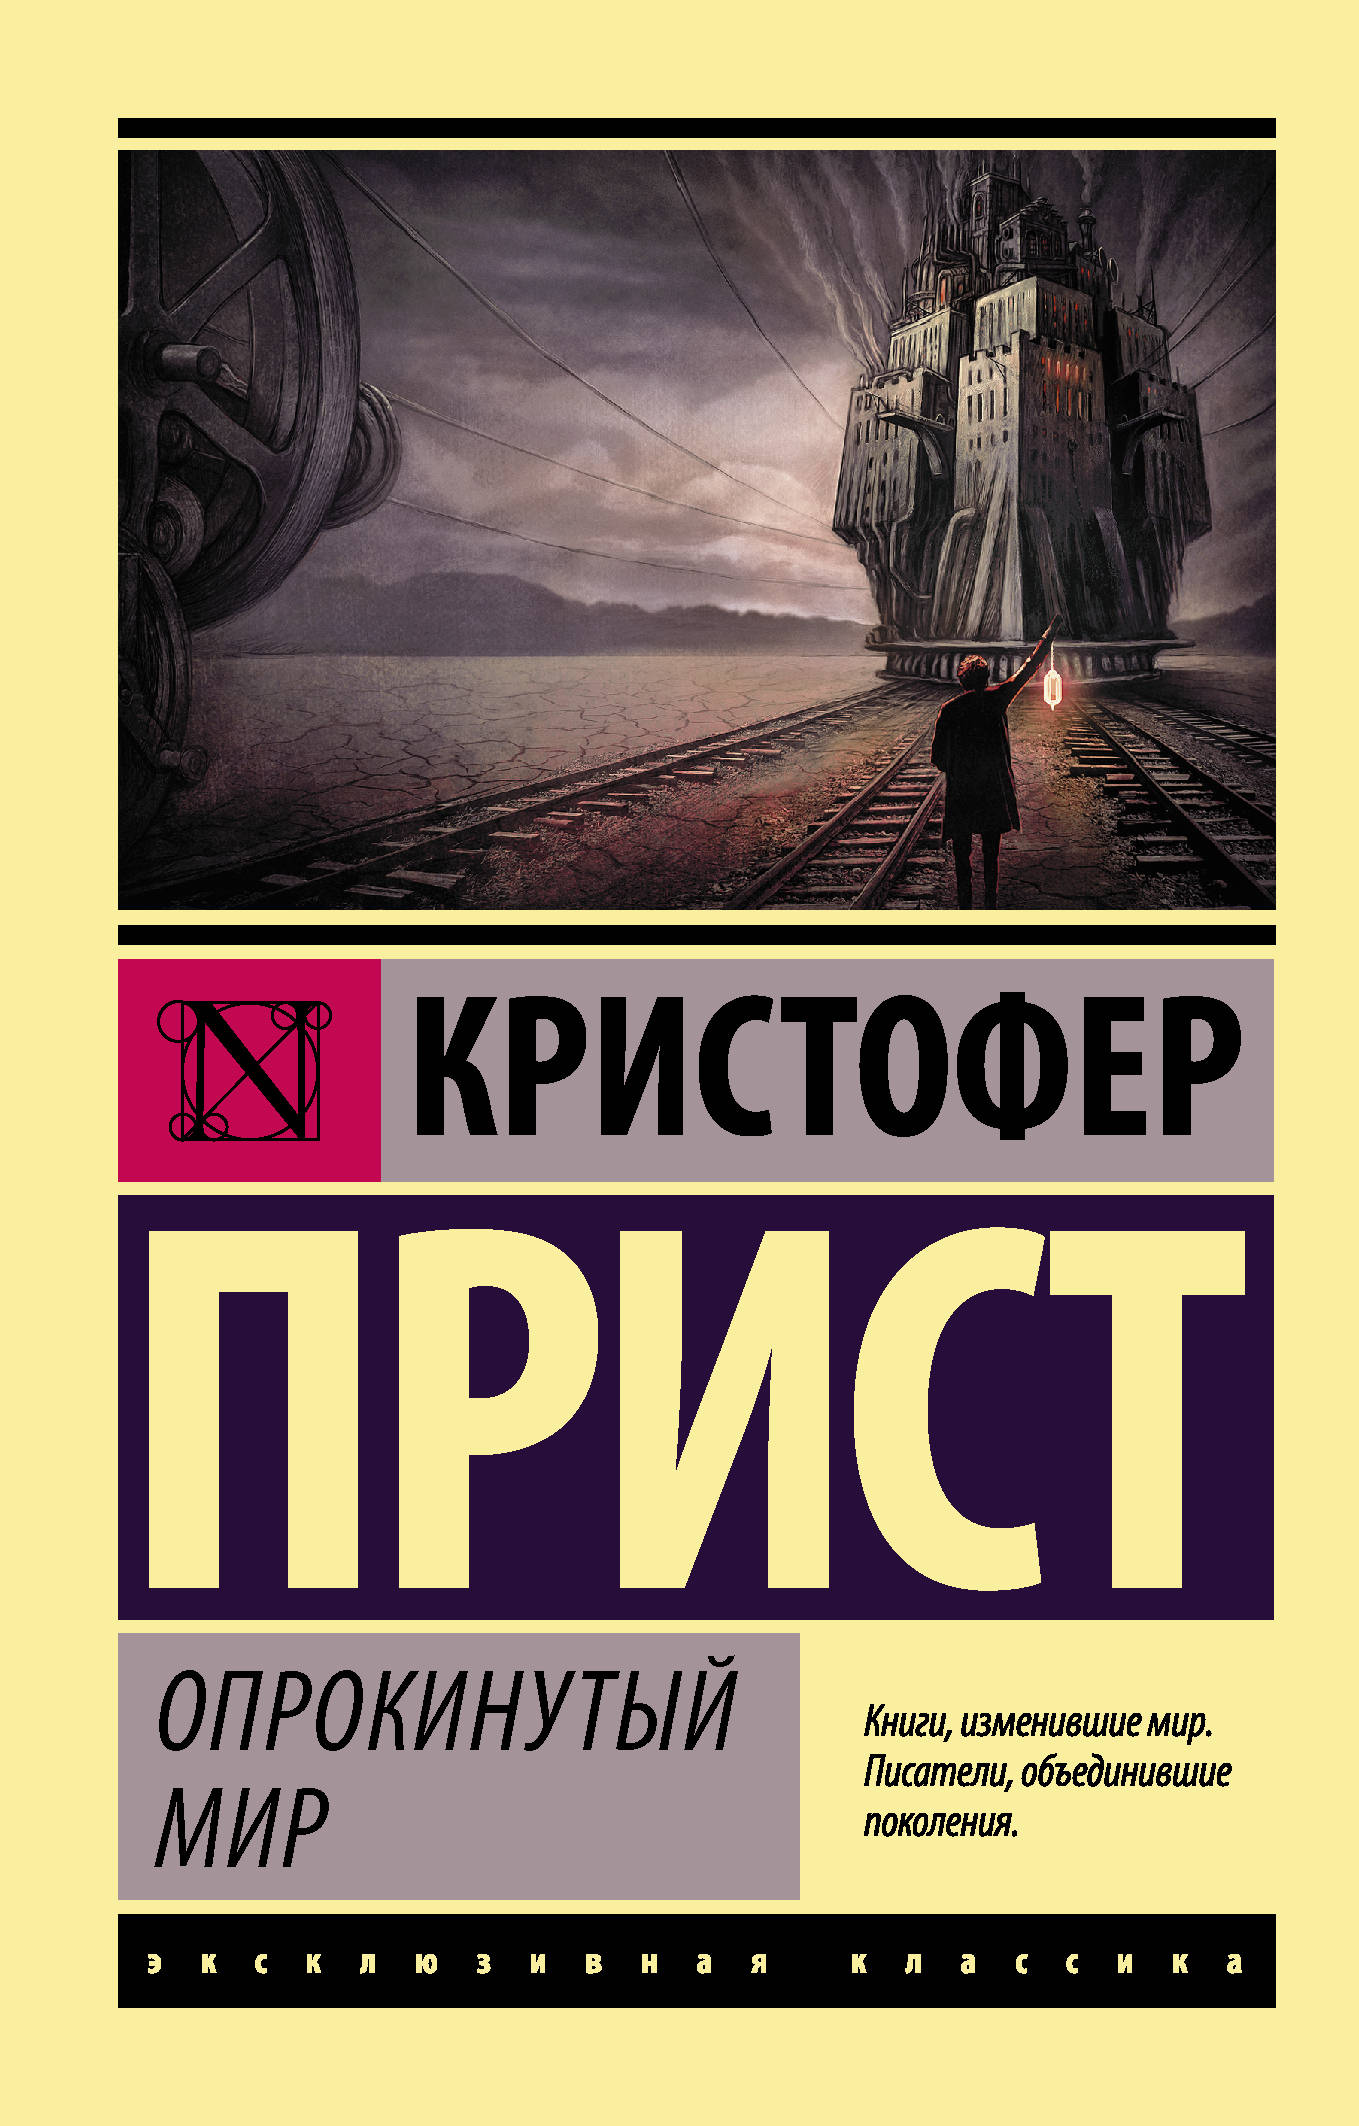 Кристофер Прист Опрокинутый мир фактор города мир фантастики 2010